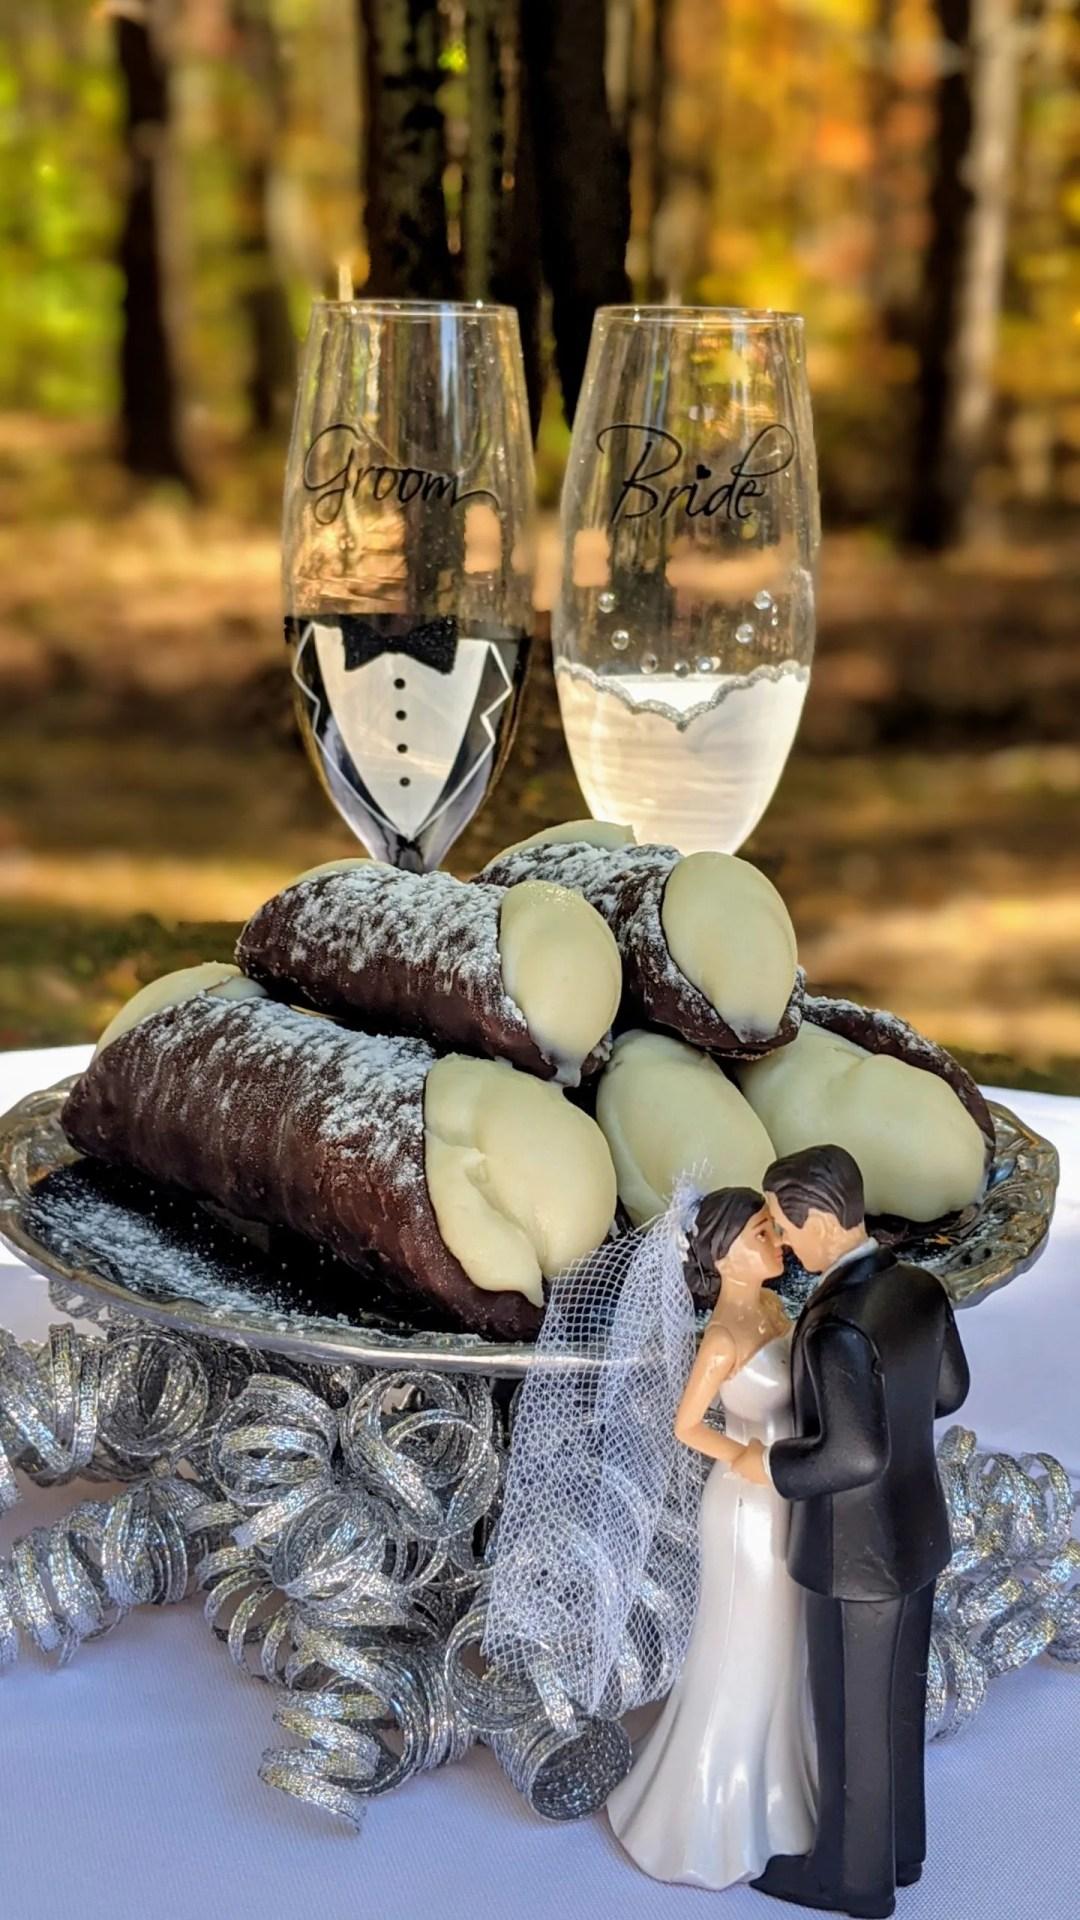 Wedding cannoli